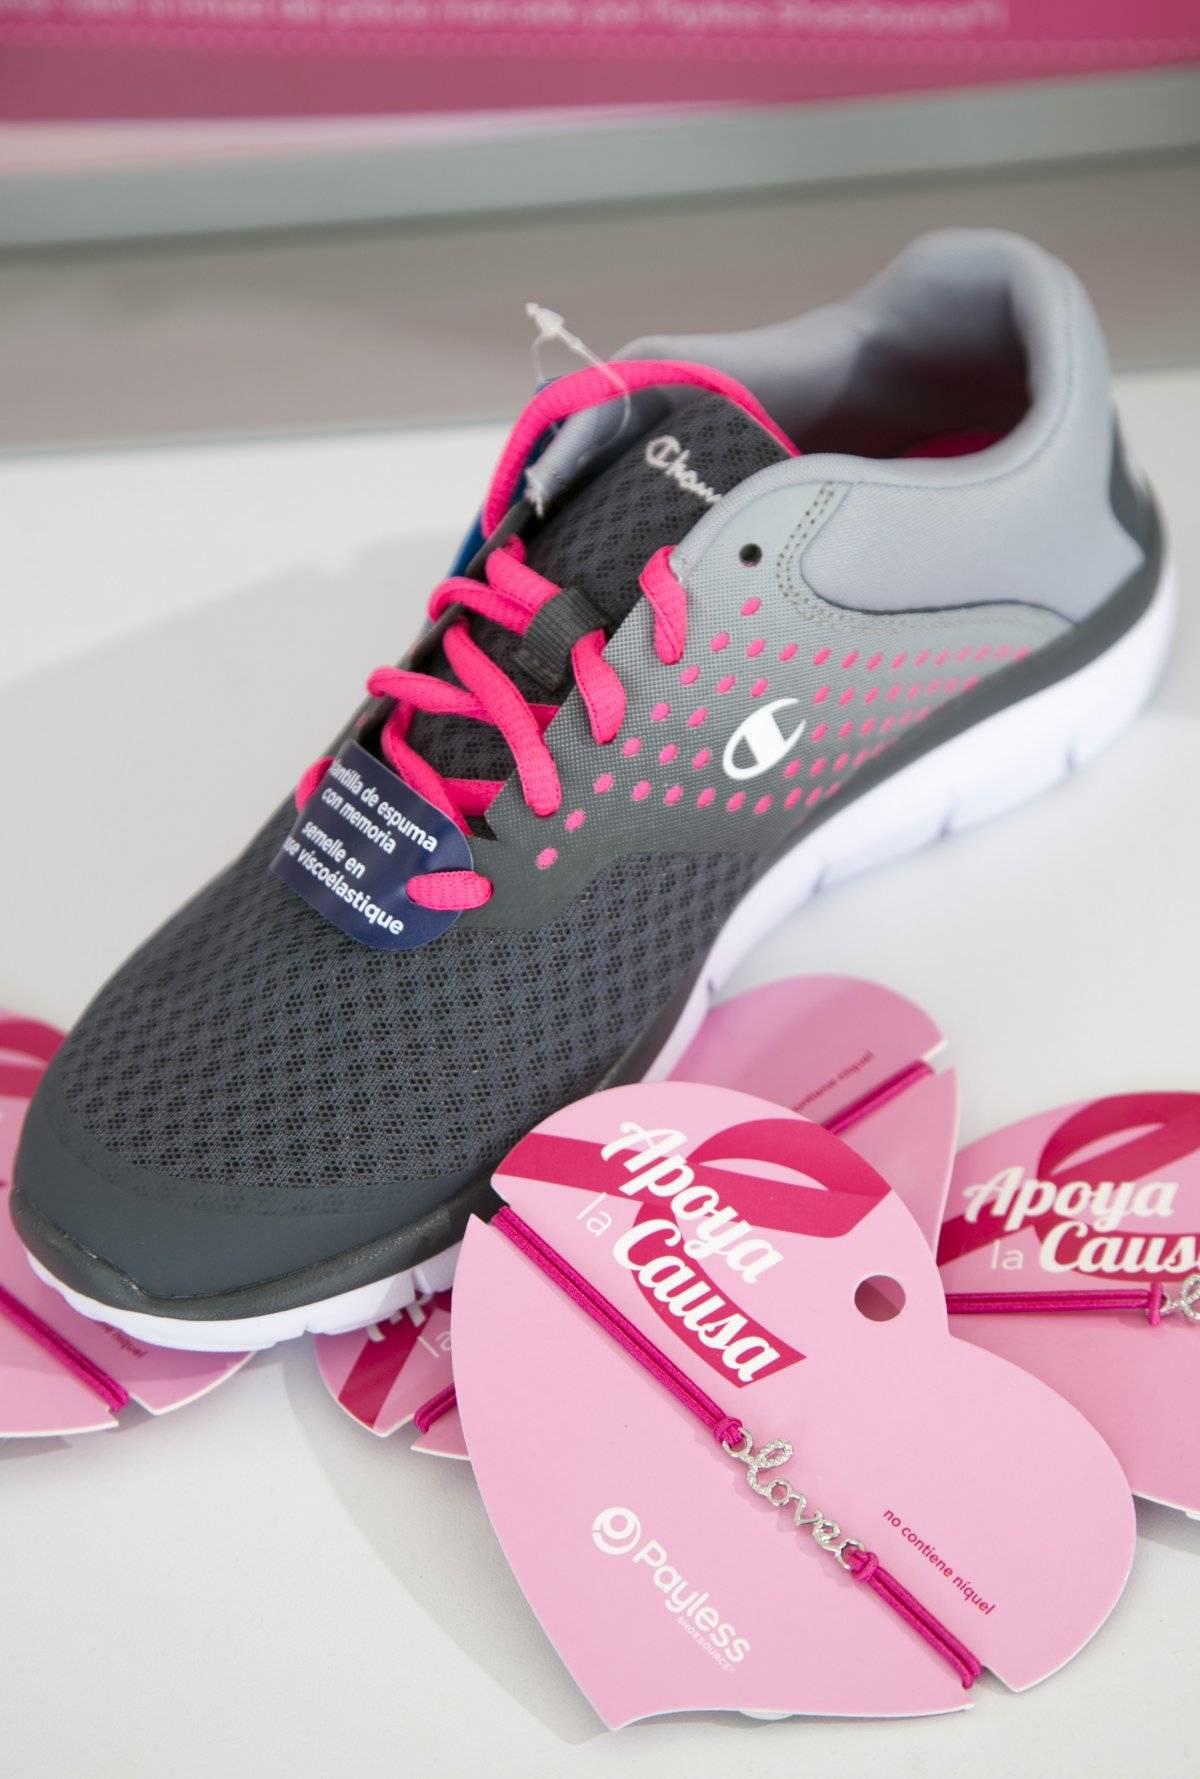 Resultado de imagen para cancer de seno Payless ShoeSource